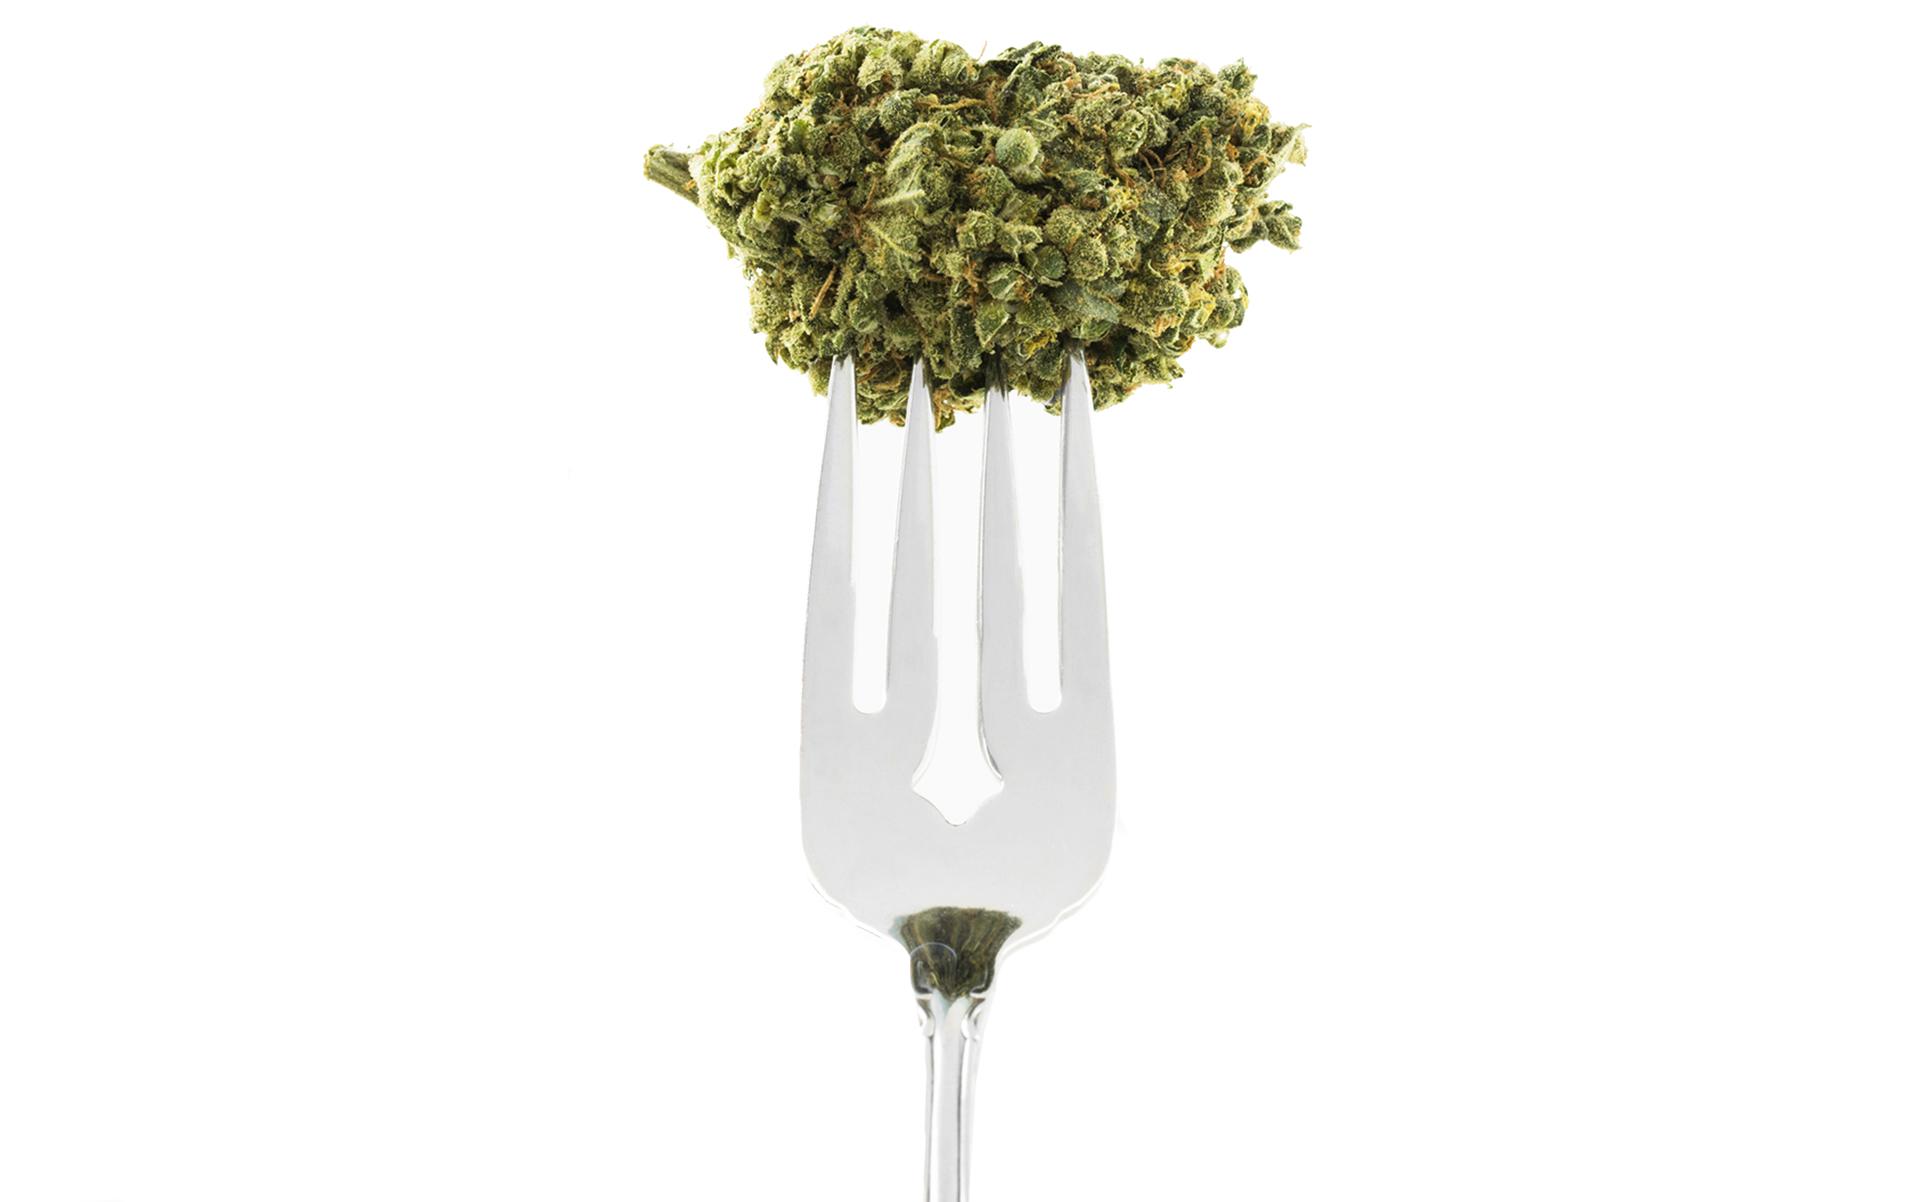 medical marijuana essays medical marijuana essay essay legalization of marijuana persuasive buscio mary argumentative essay on weed argumentative essay